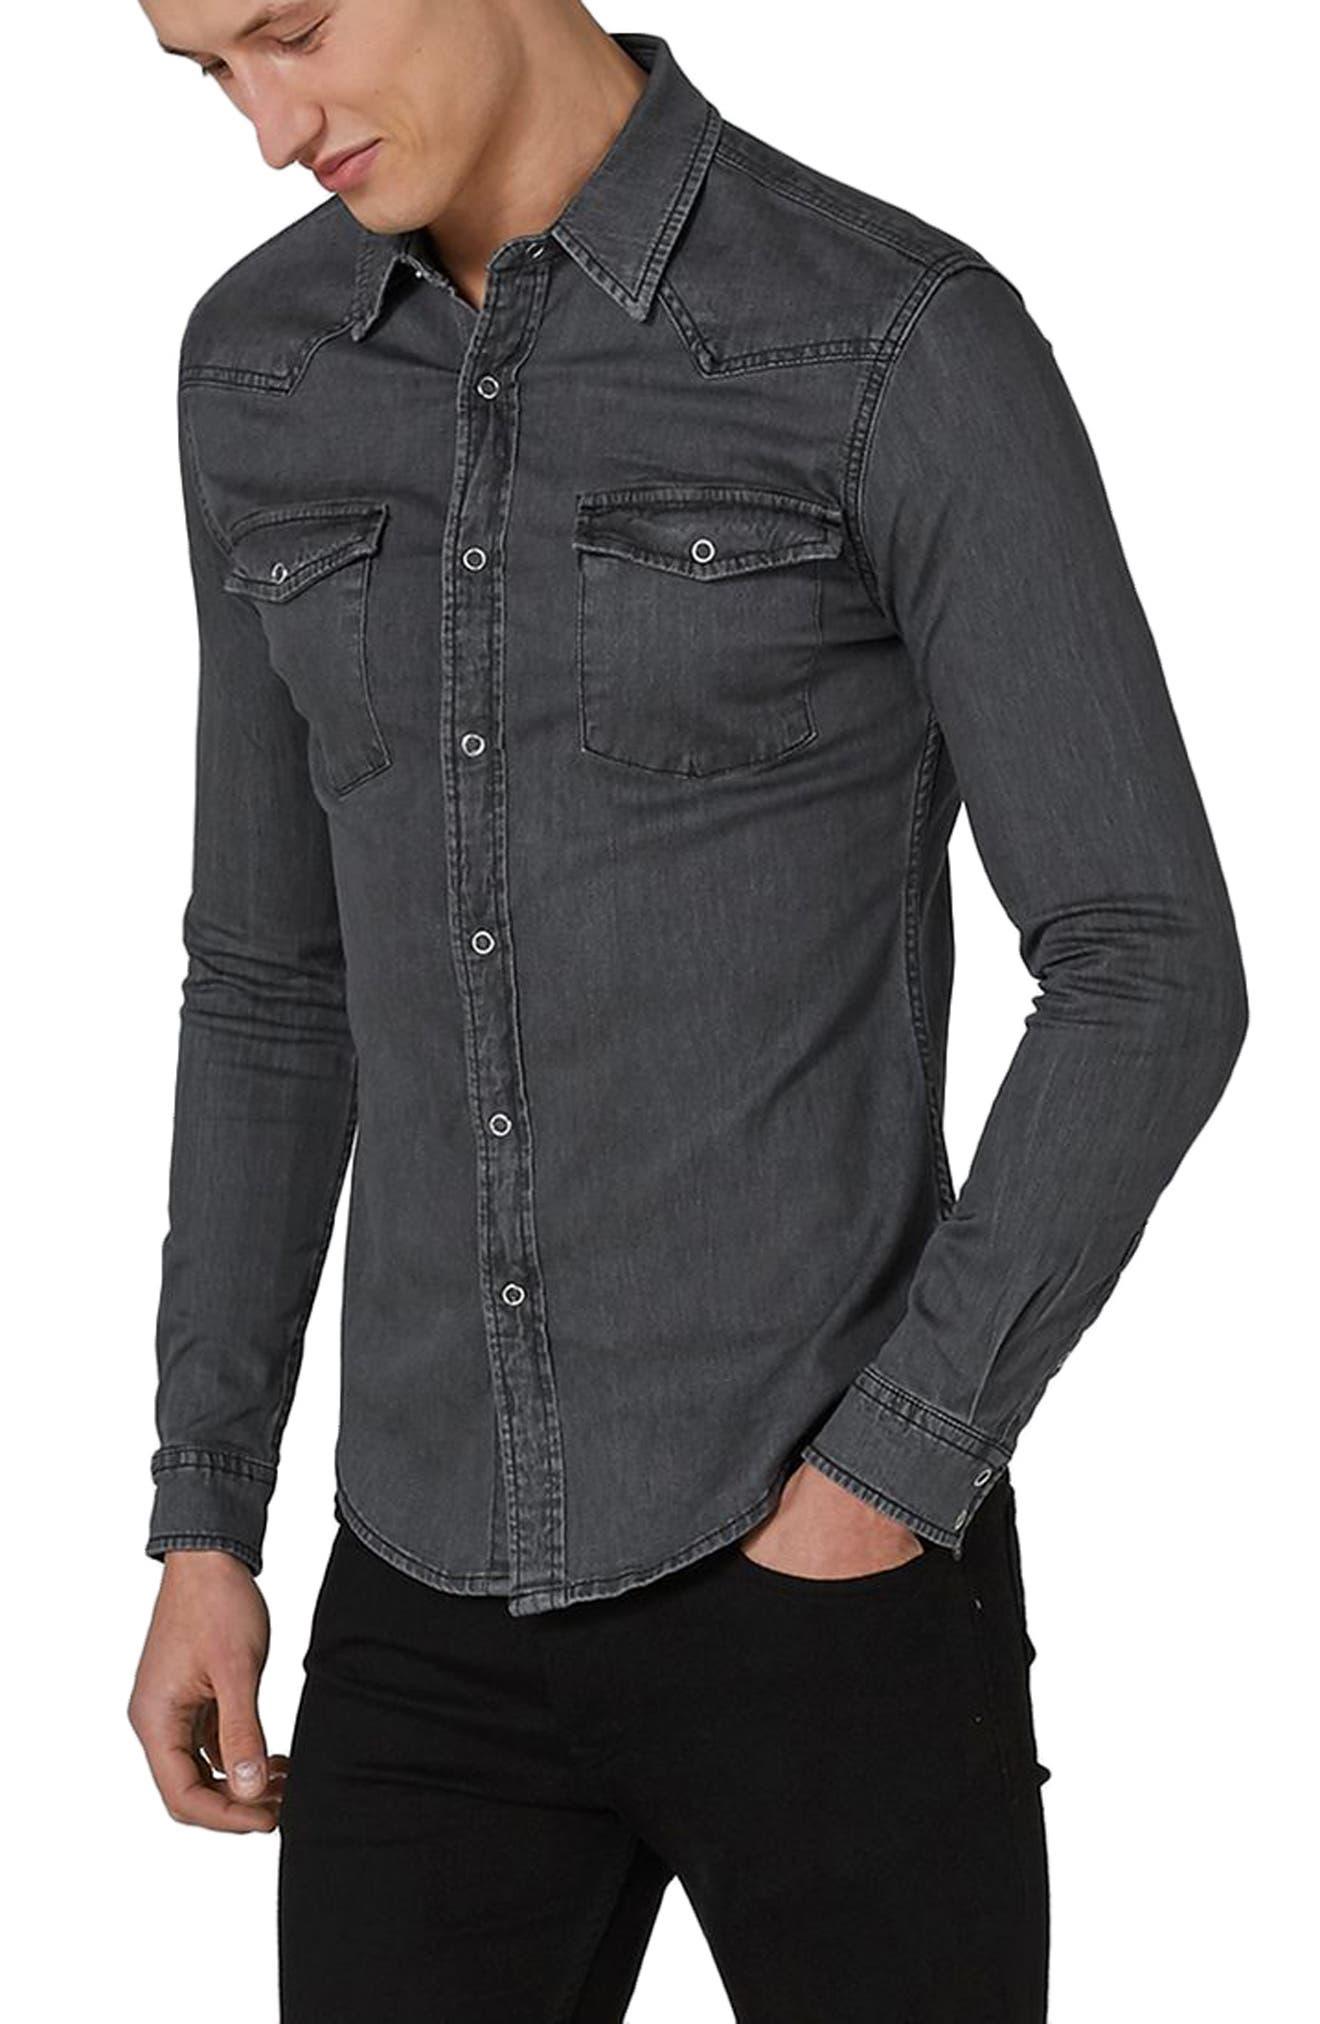 TOPMAN Muscle Fit Denim Western Shirt, Main, color, 010